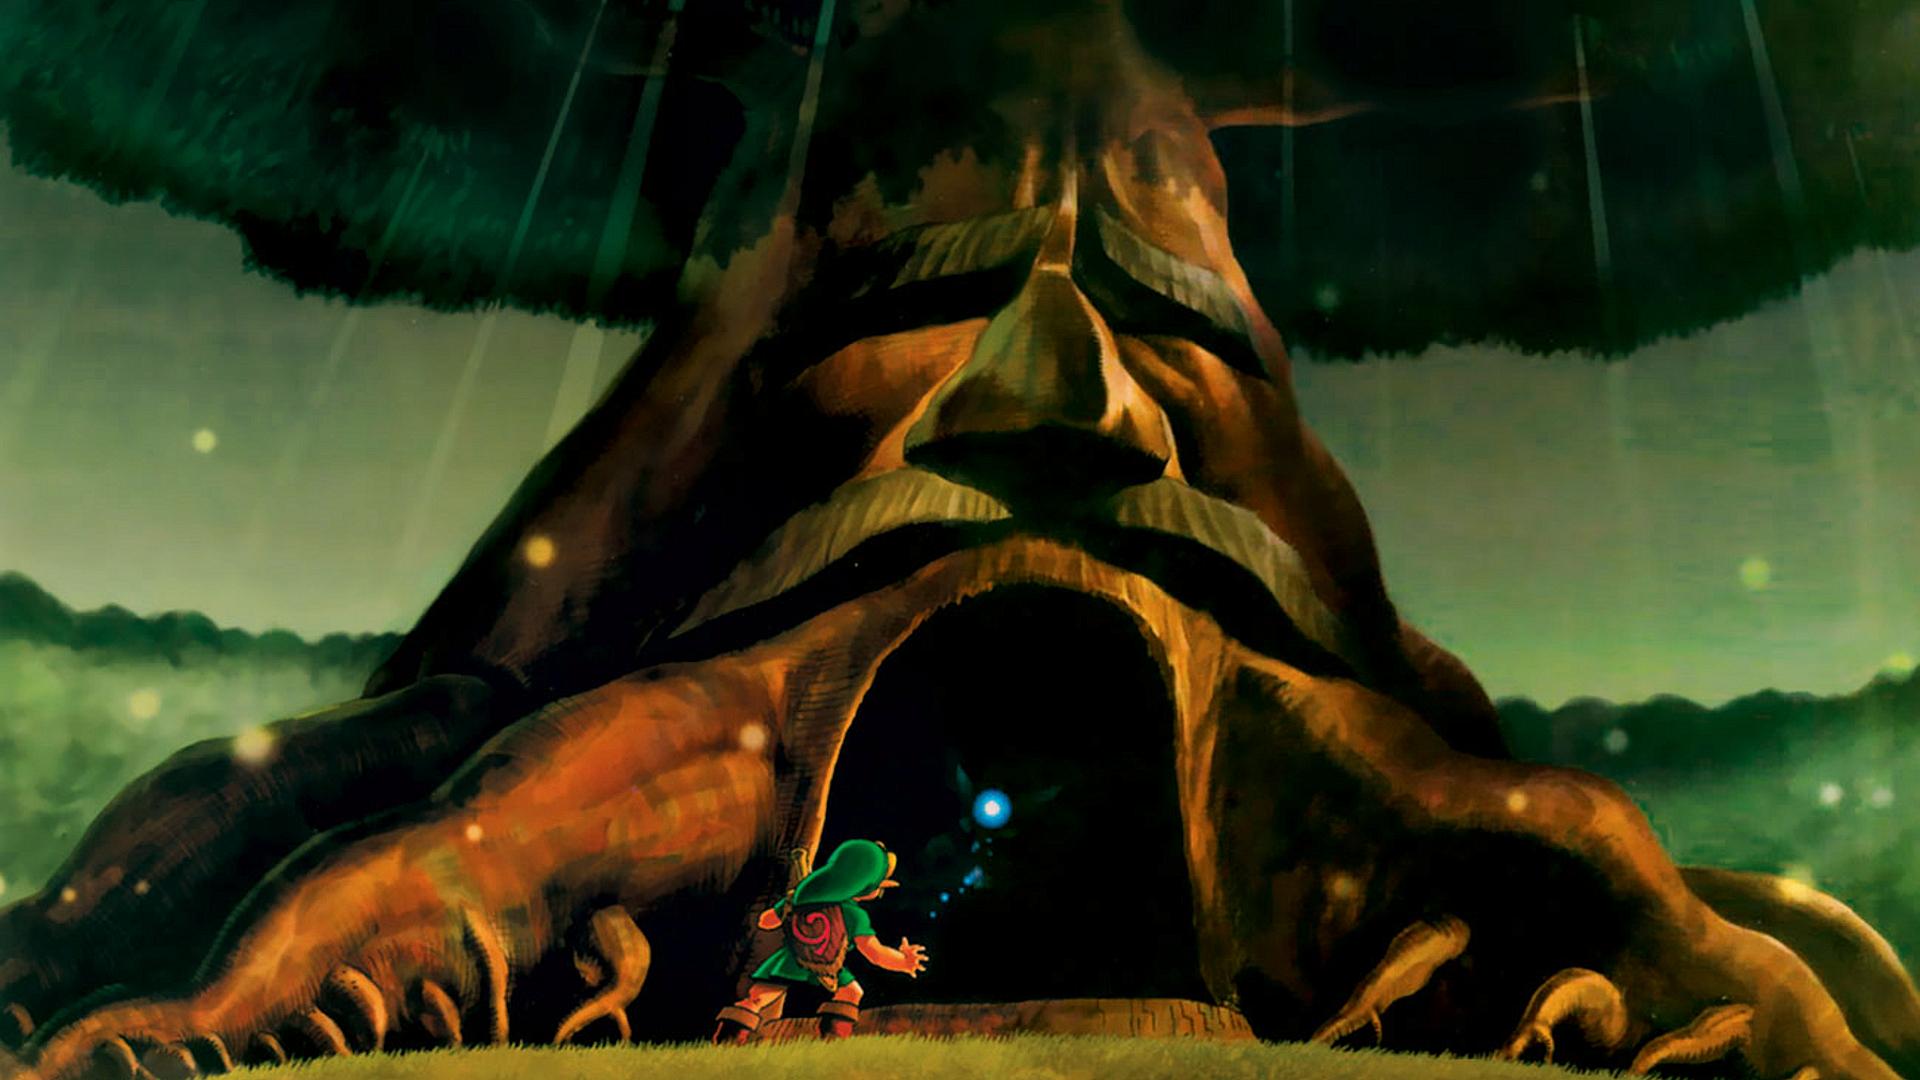 Legend Of Zelda Ocarina Of Time wallpaper 99880 1920x1080